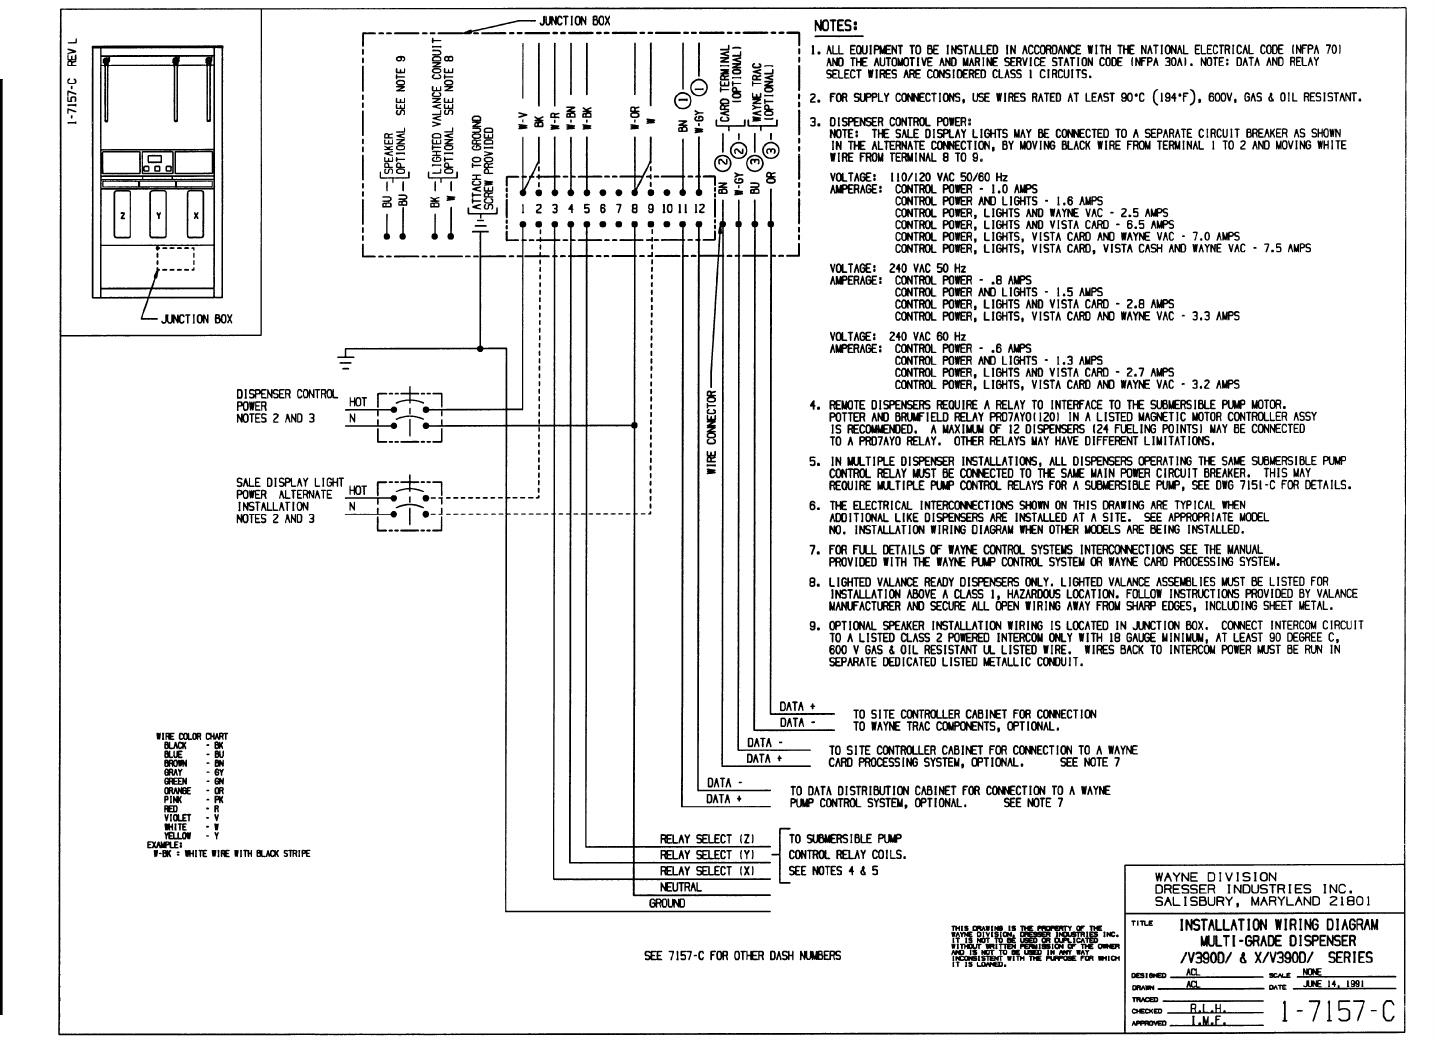 Wayne Fueling Systems VISTA RF ID Tag Reader User Manual ... on wiring diagrams for peterbilt trucks, flywheel key, ford key, valve key, honda key, tractor key, radiator key,